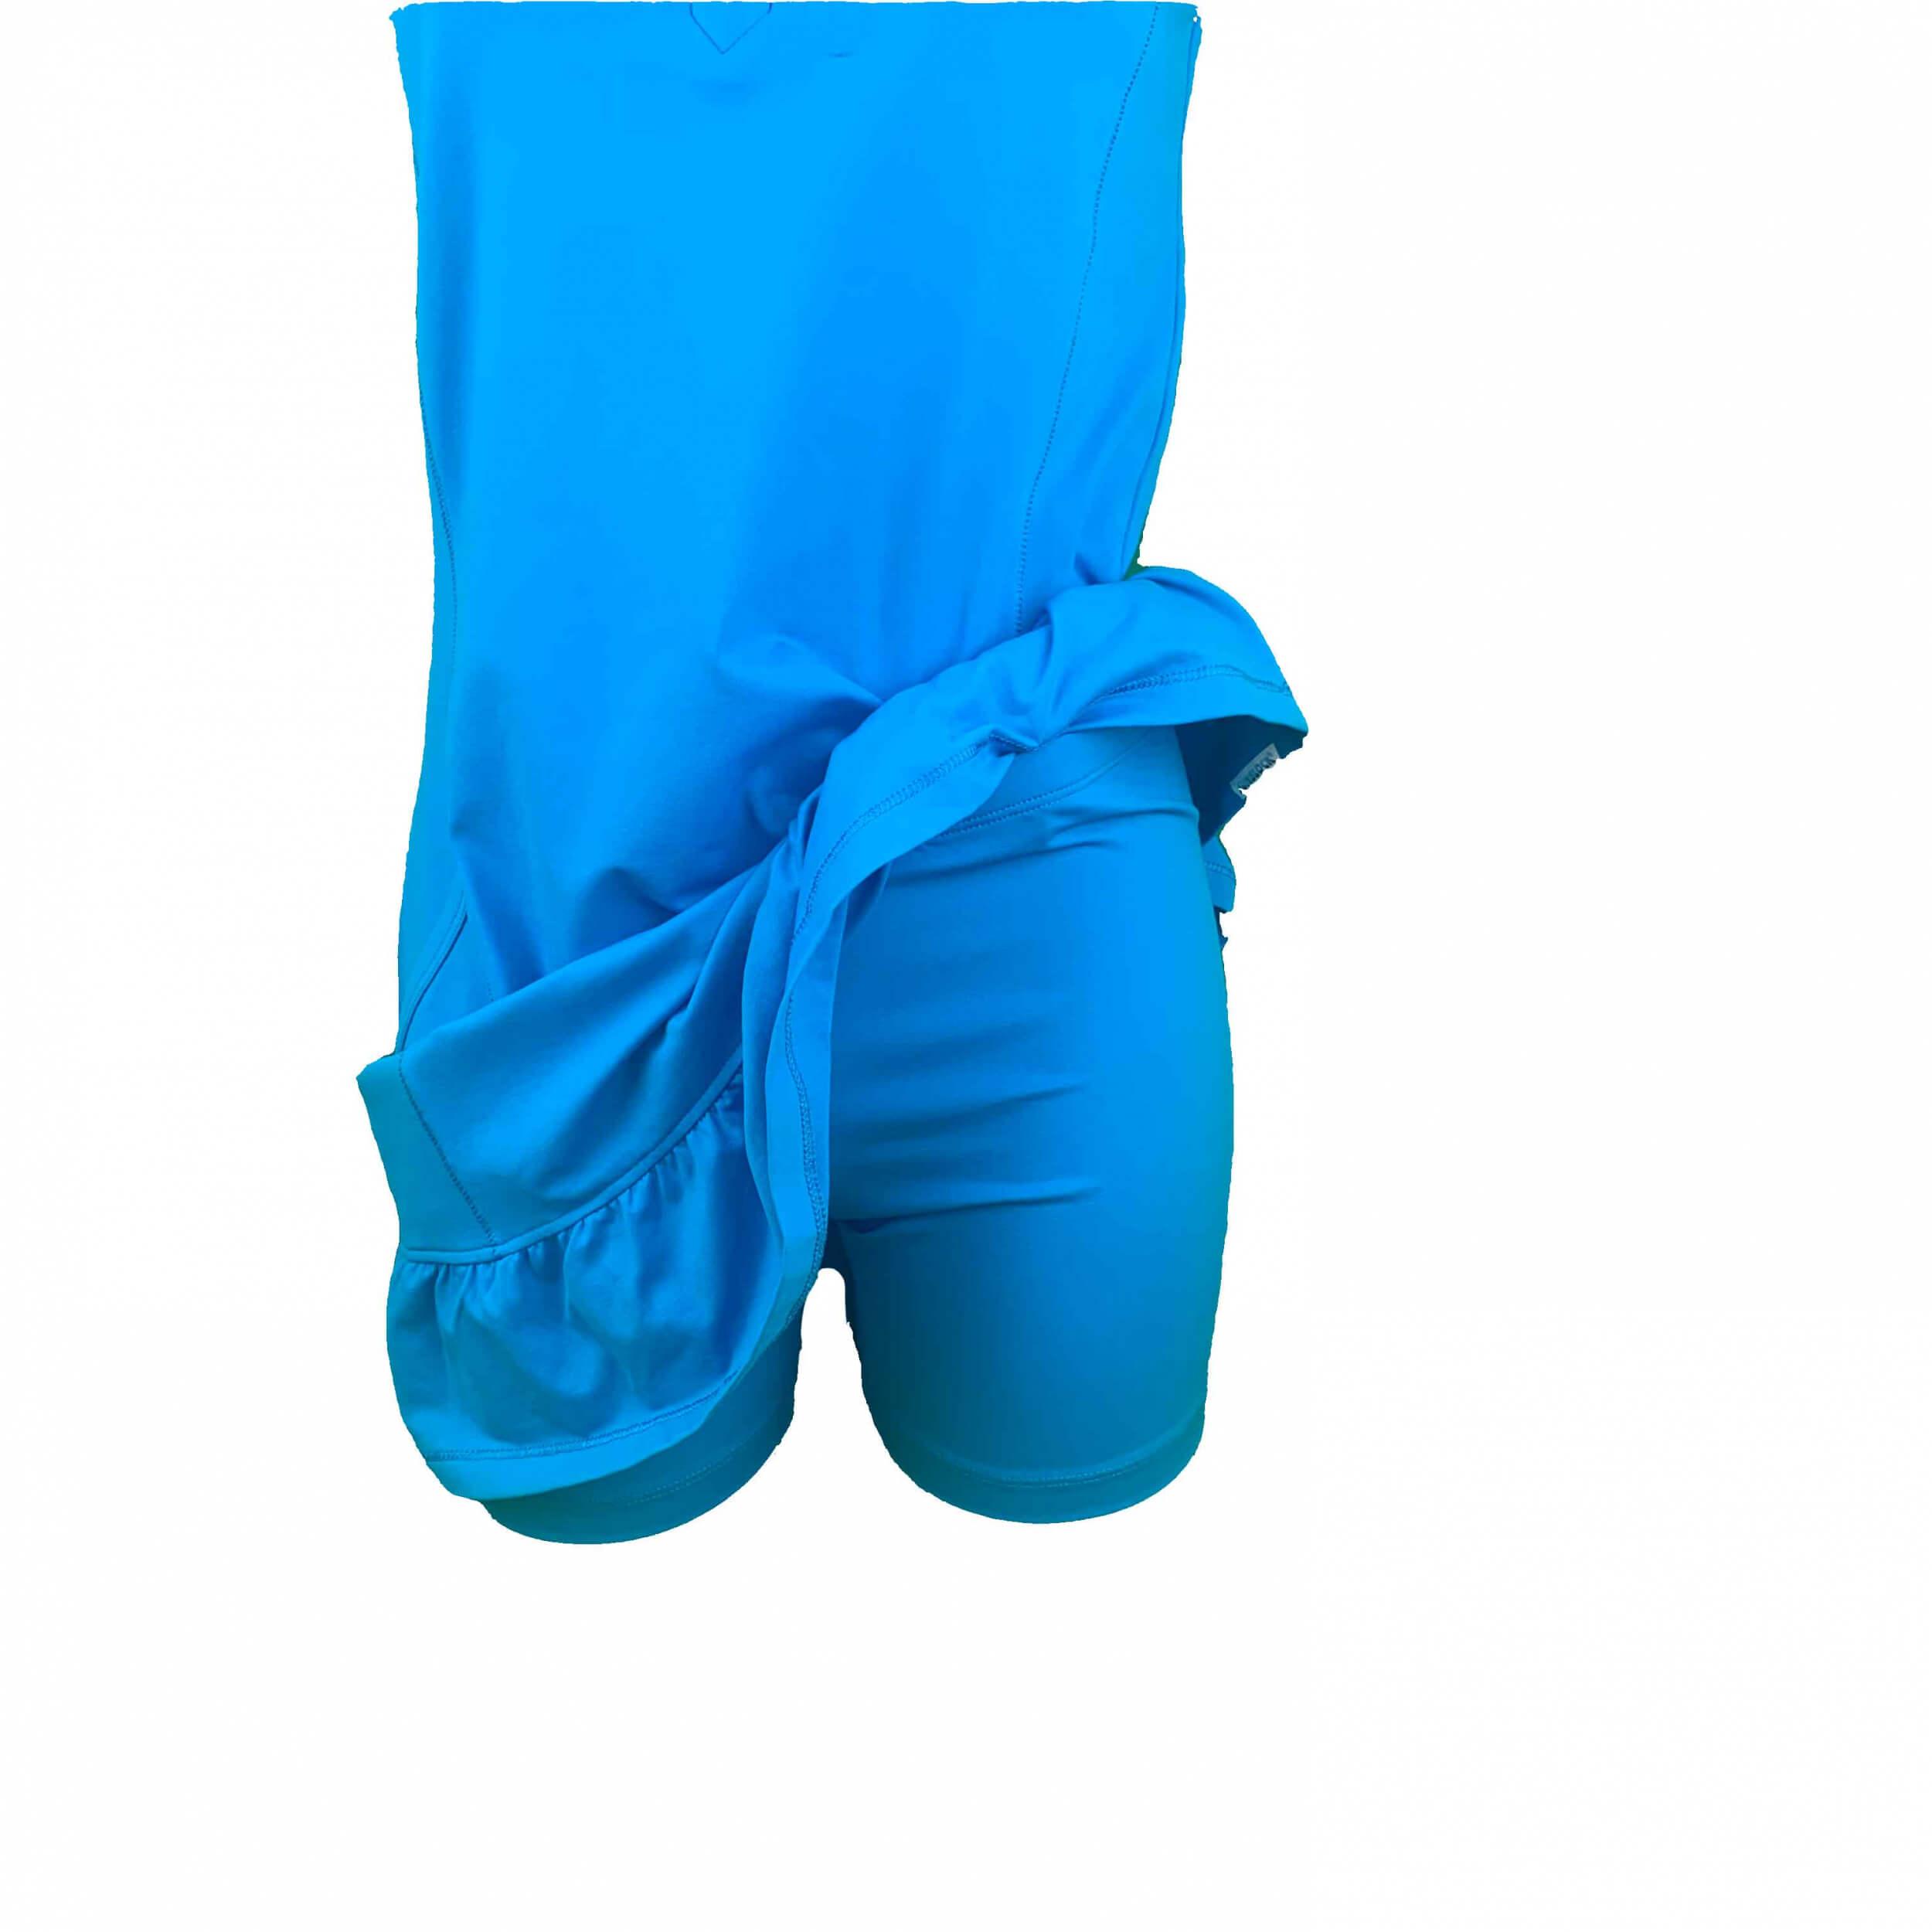 Chervo Damen Kleid Japur Sun Block royal blau 2.Wahl